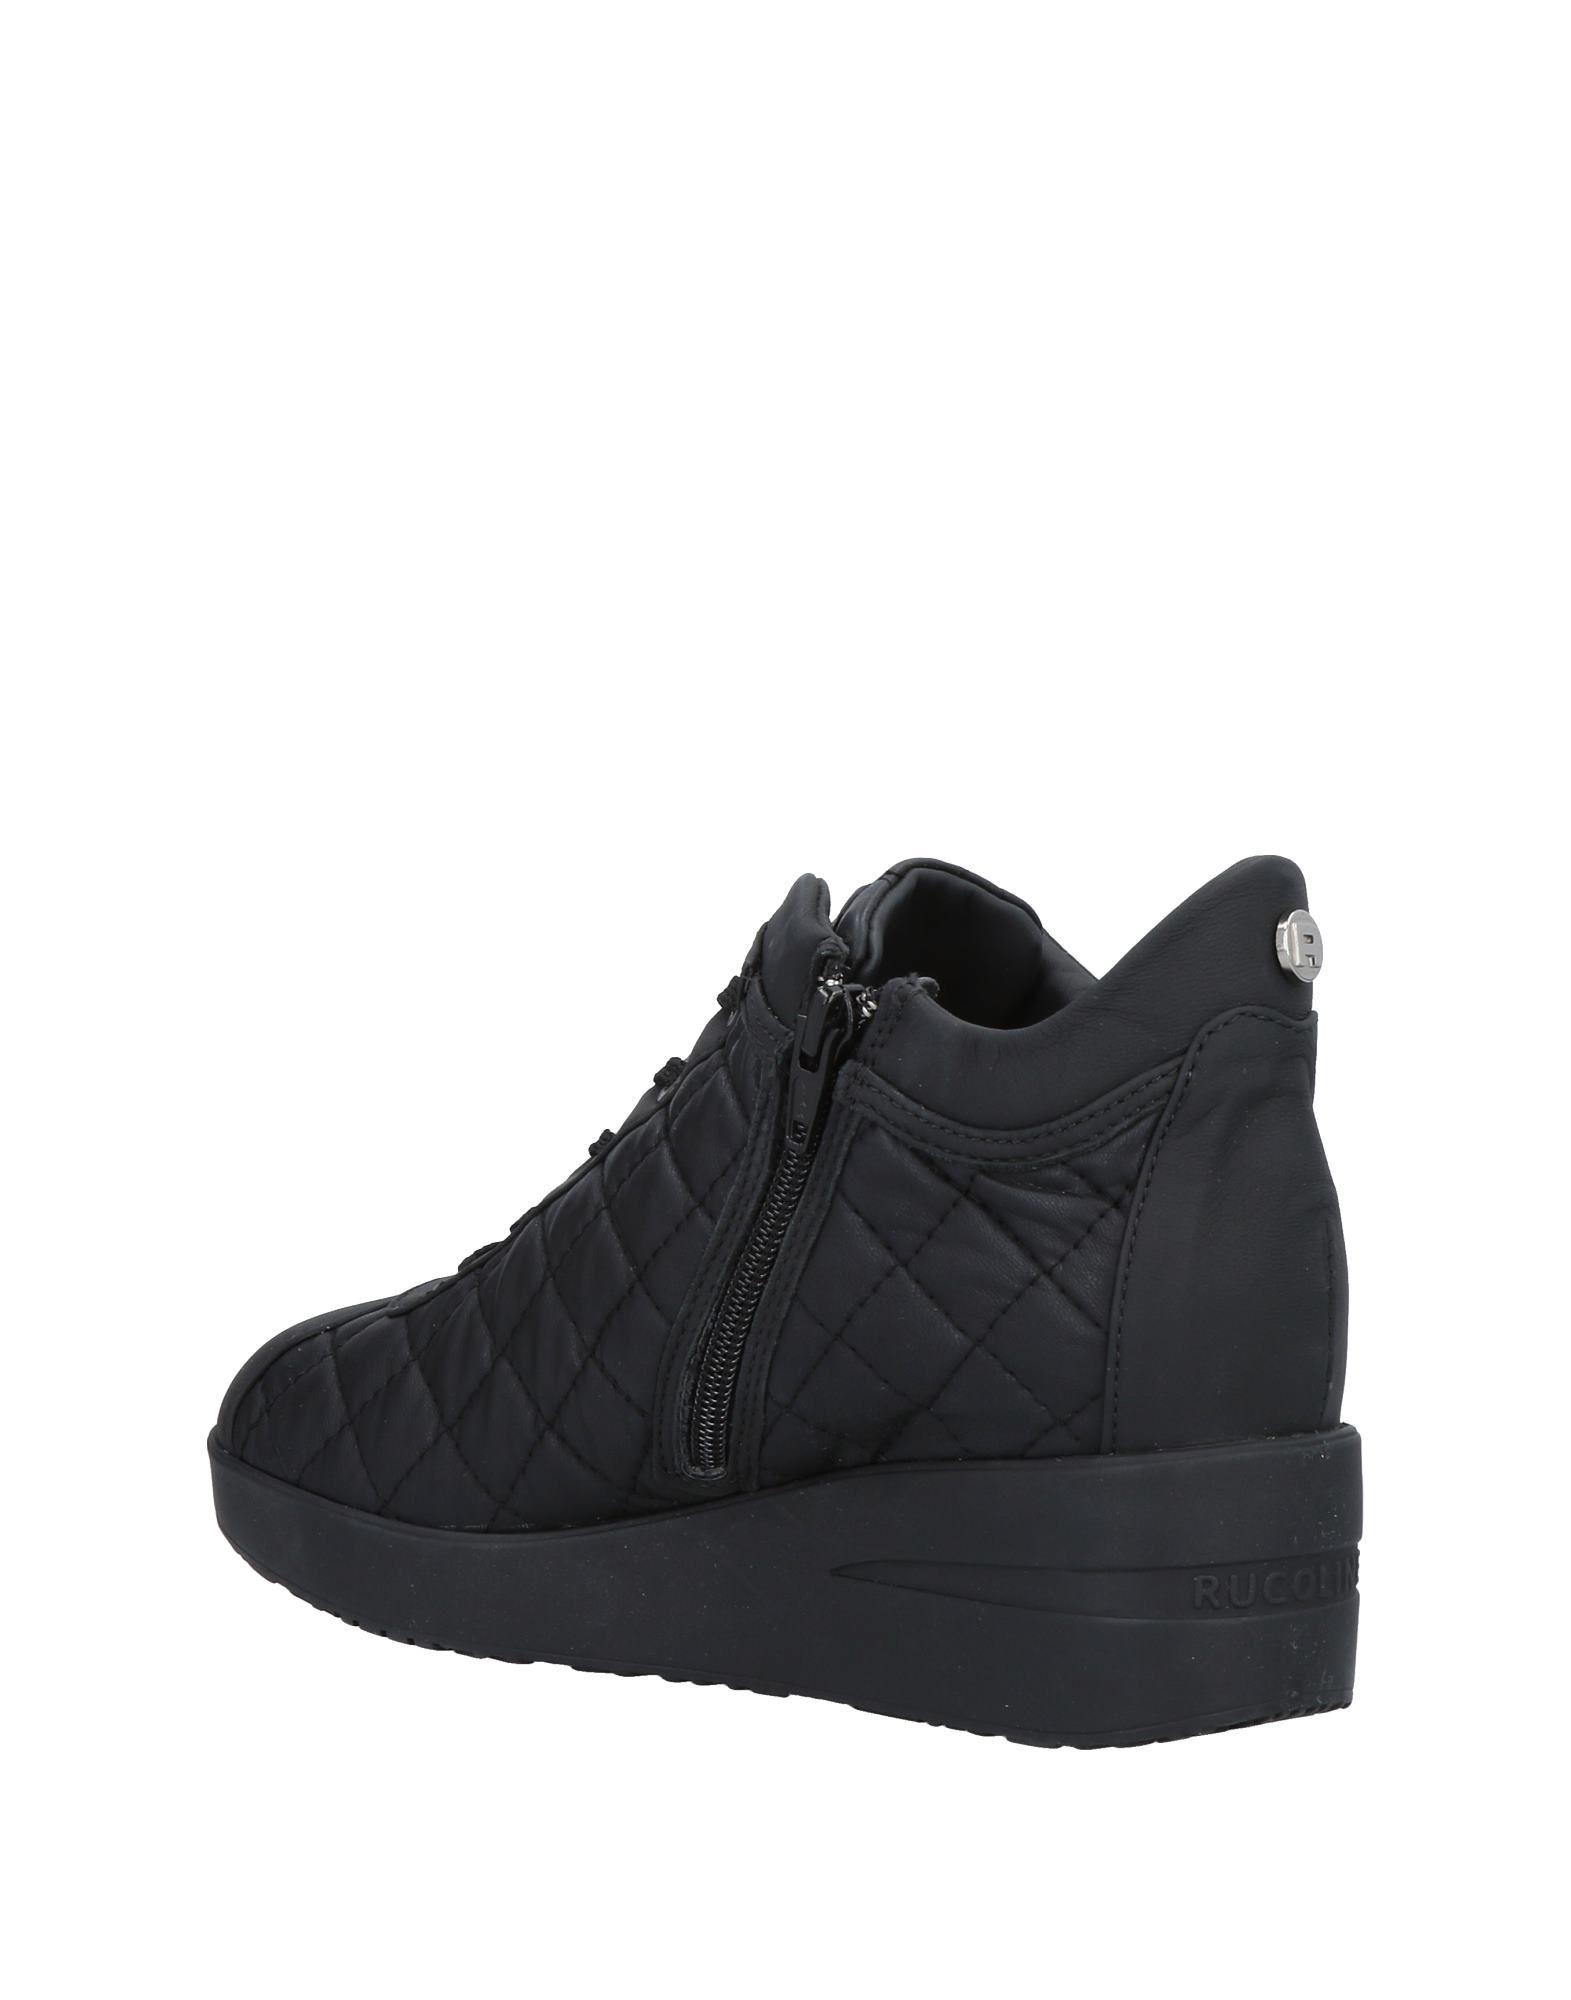 Gut um billige Schuhe Damen zu tragenRuco Line Turnschuhes Damen Schuhe 11476865XF 1b9fd0